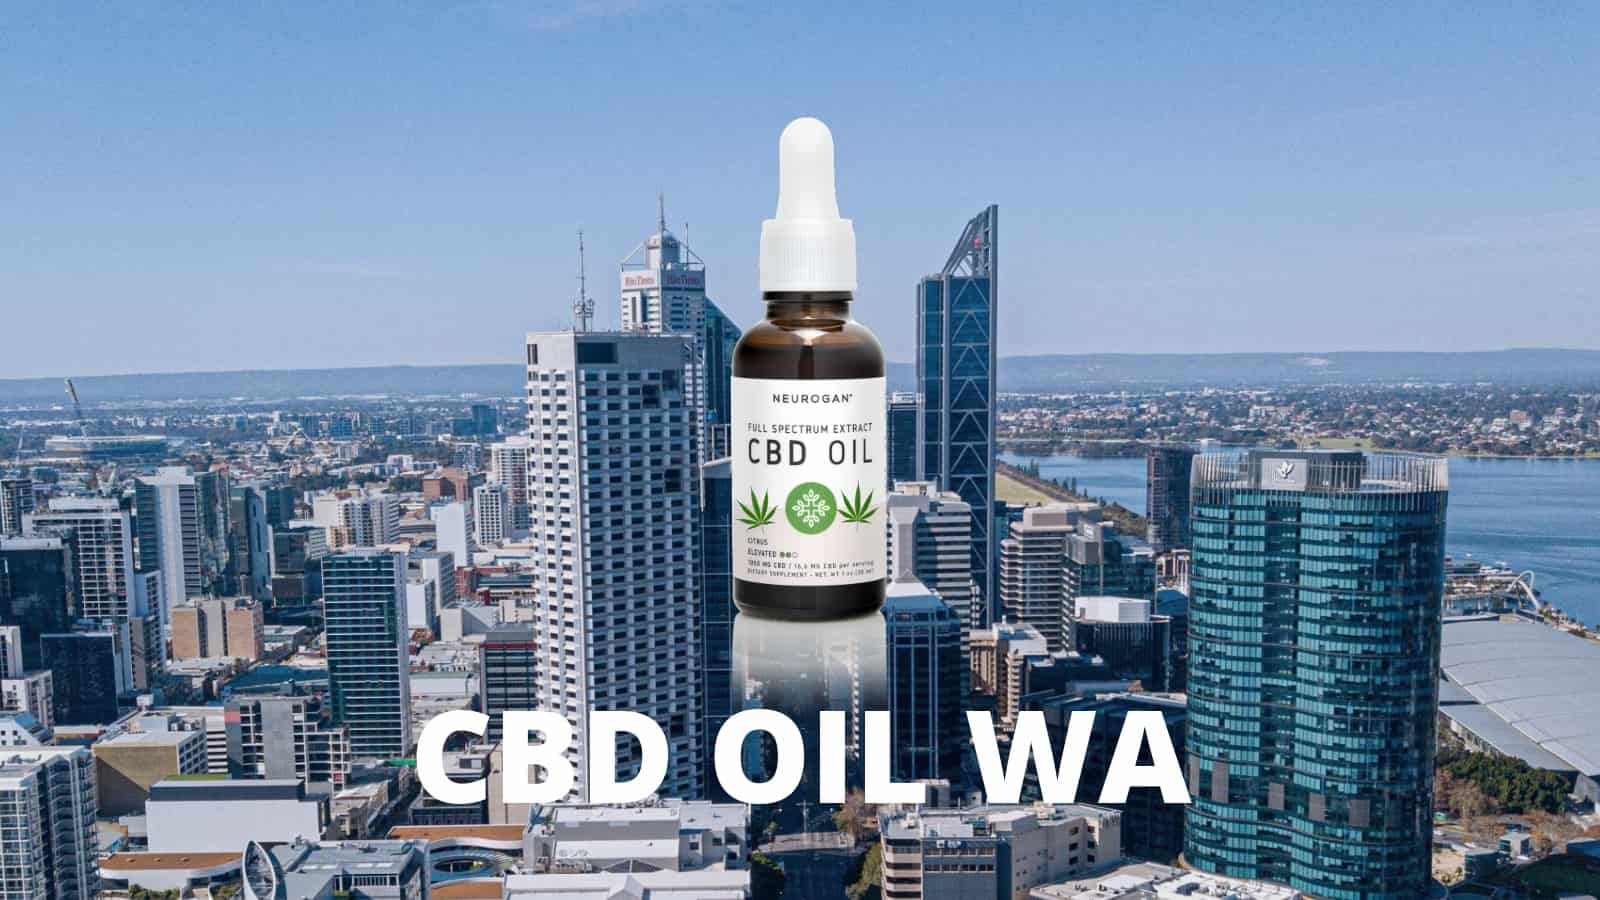 Is CBD Oil Legal in WA?